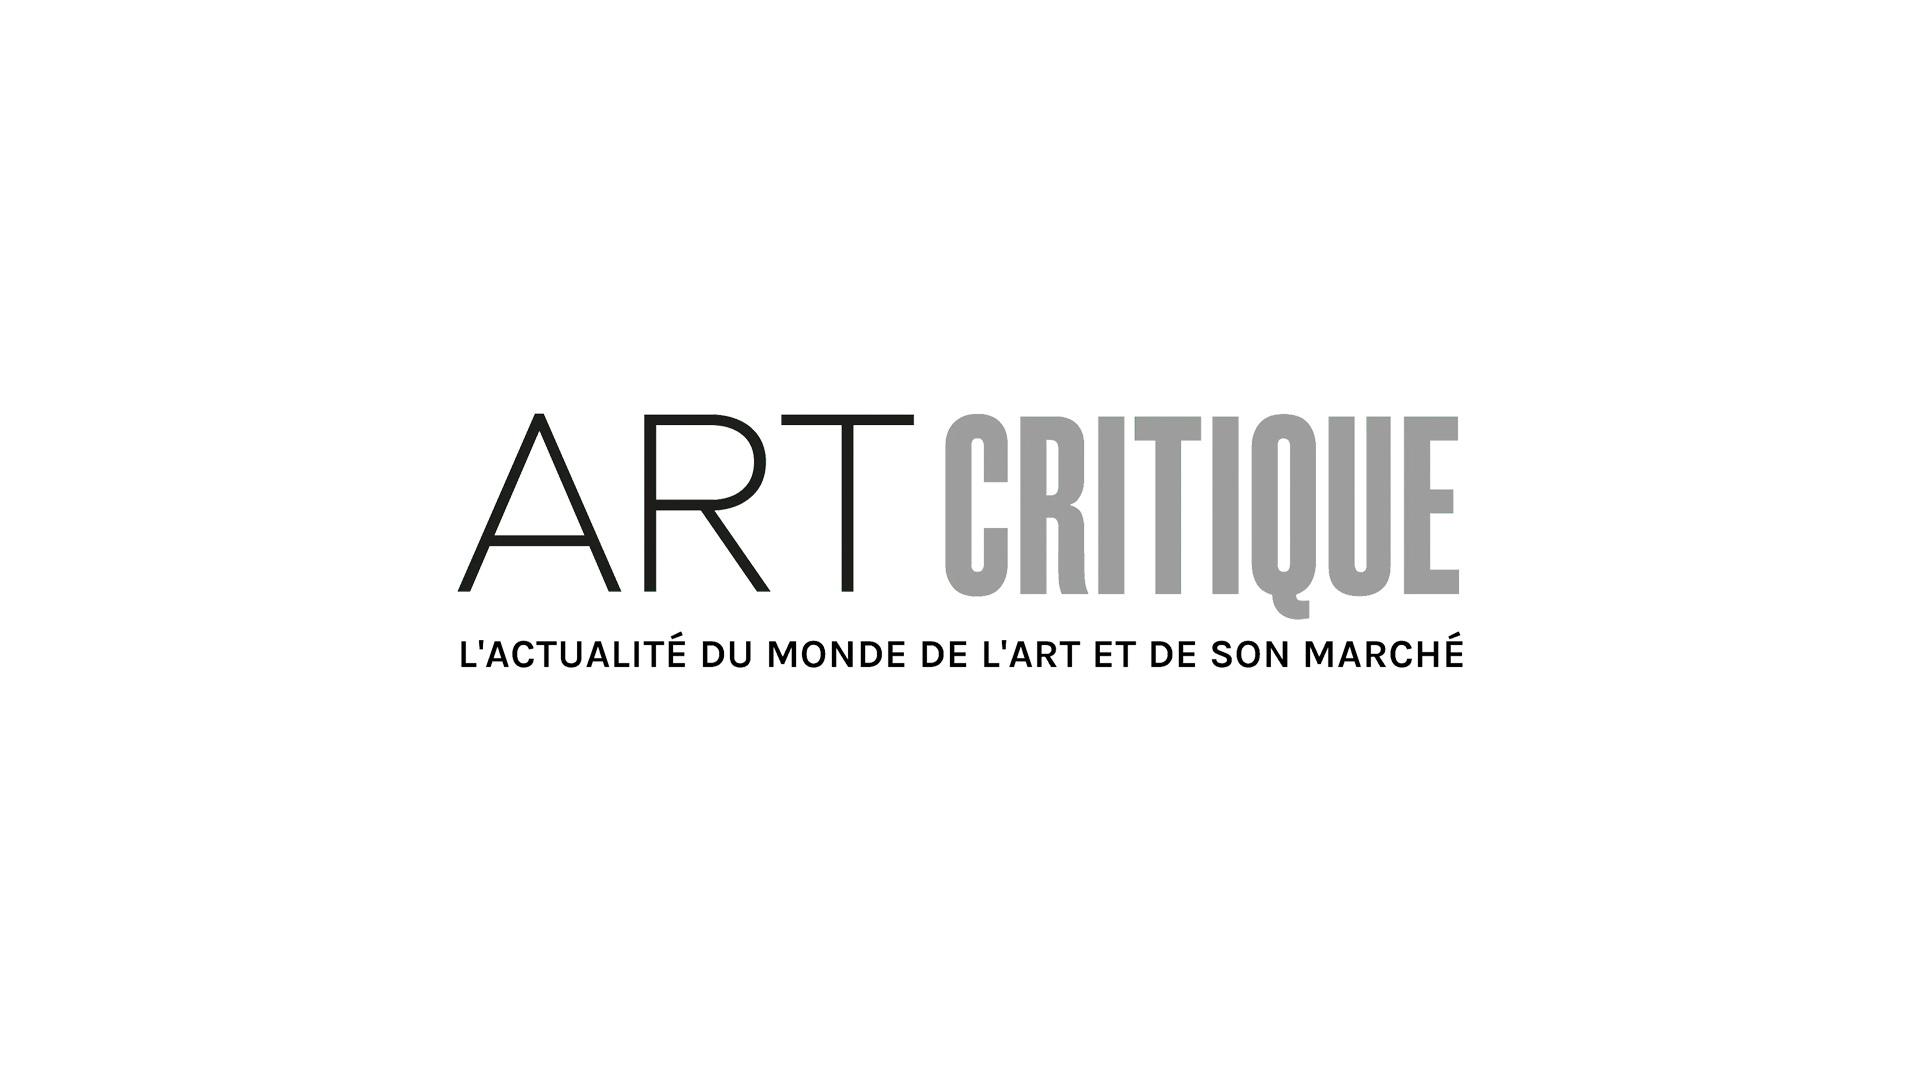 Symbols of Renaissance art decoded: Part I